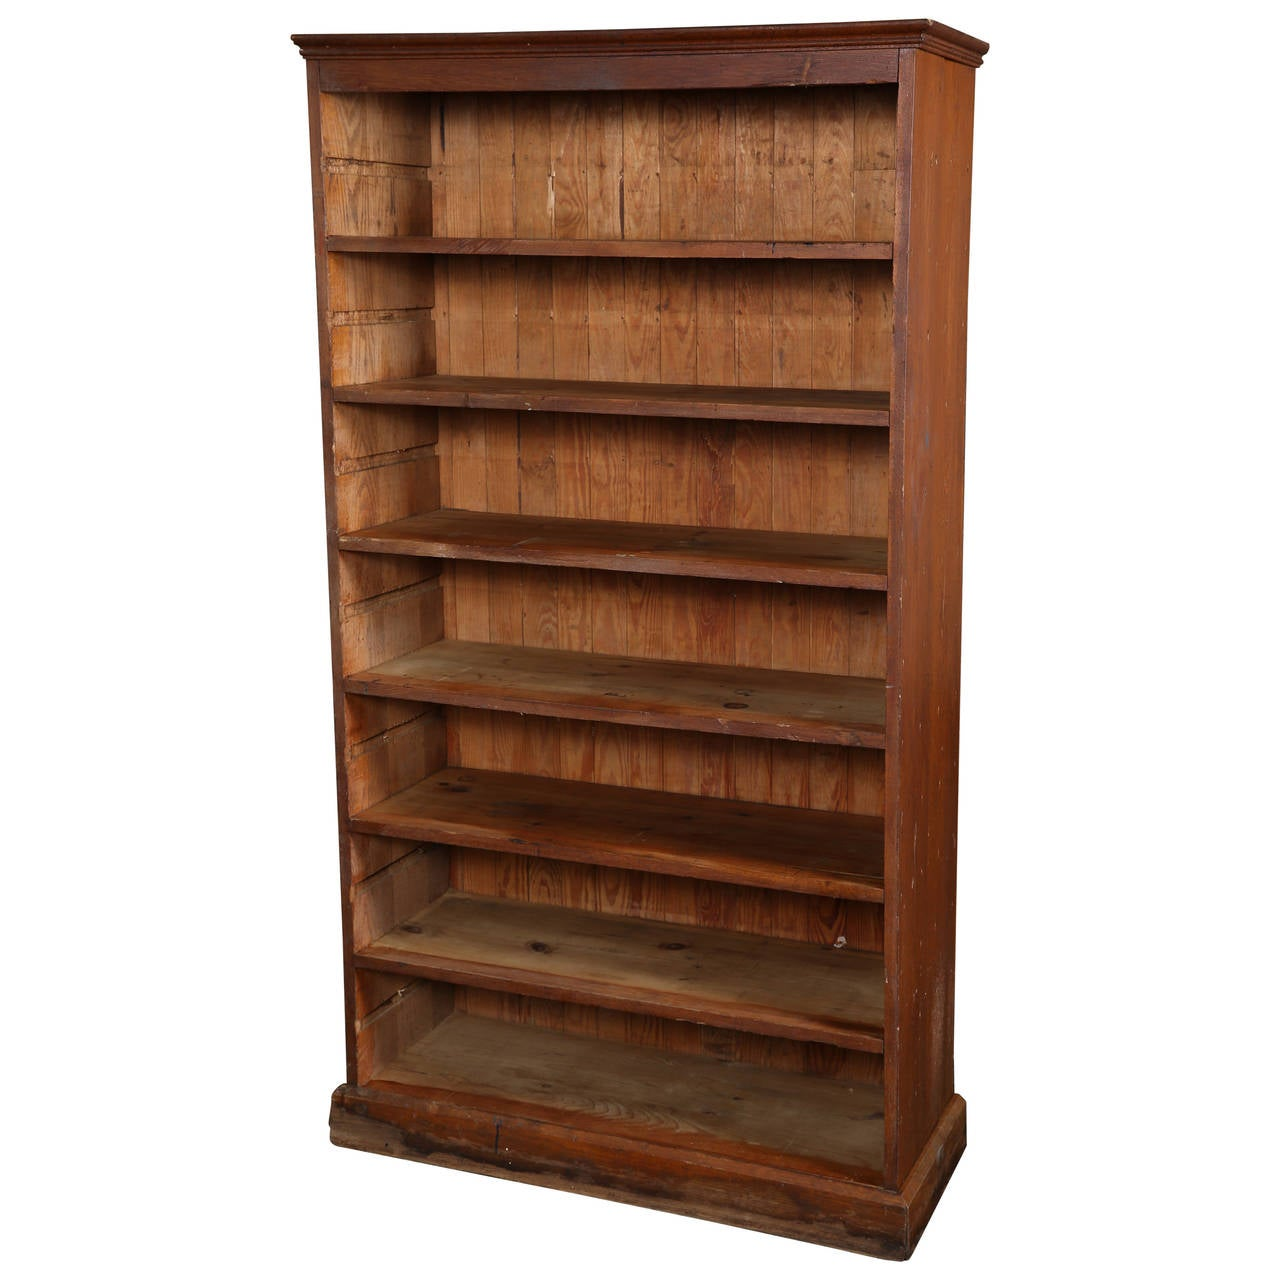 Vintage Wooden Bookcase For Sale At 1stdibs